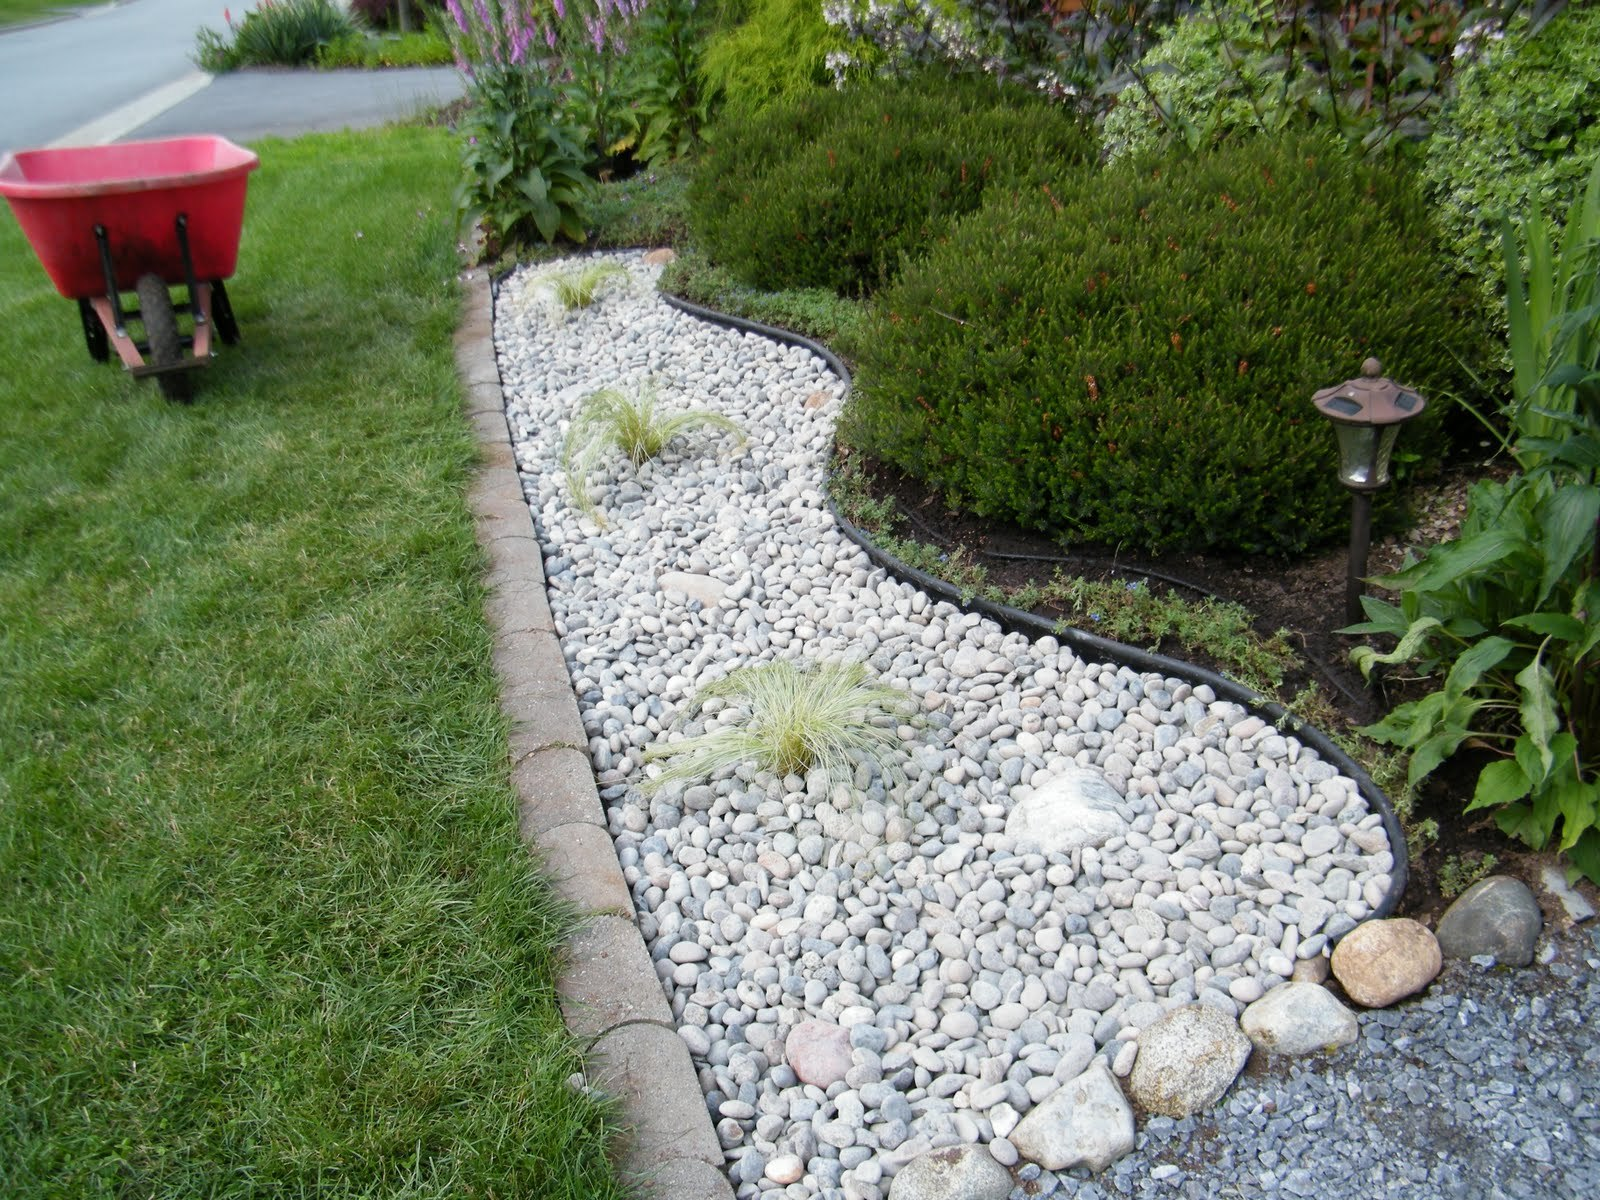 Home and Garden Design: decorative mosaic garden stepping stones